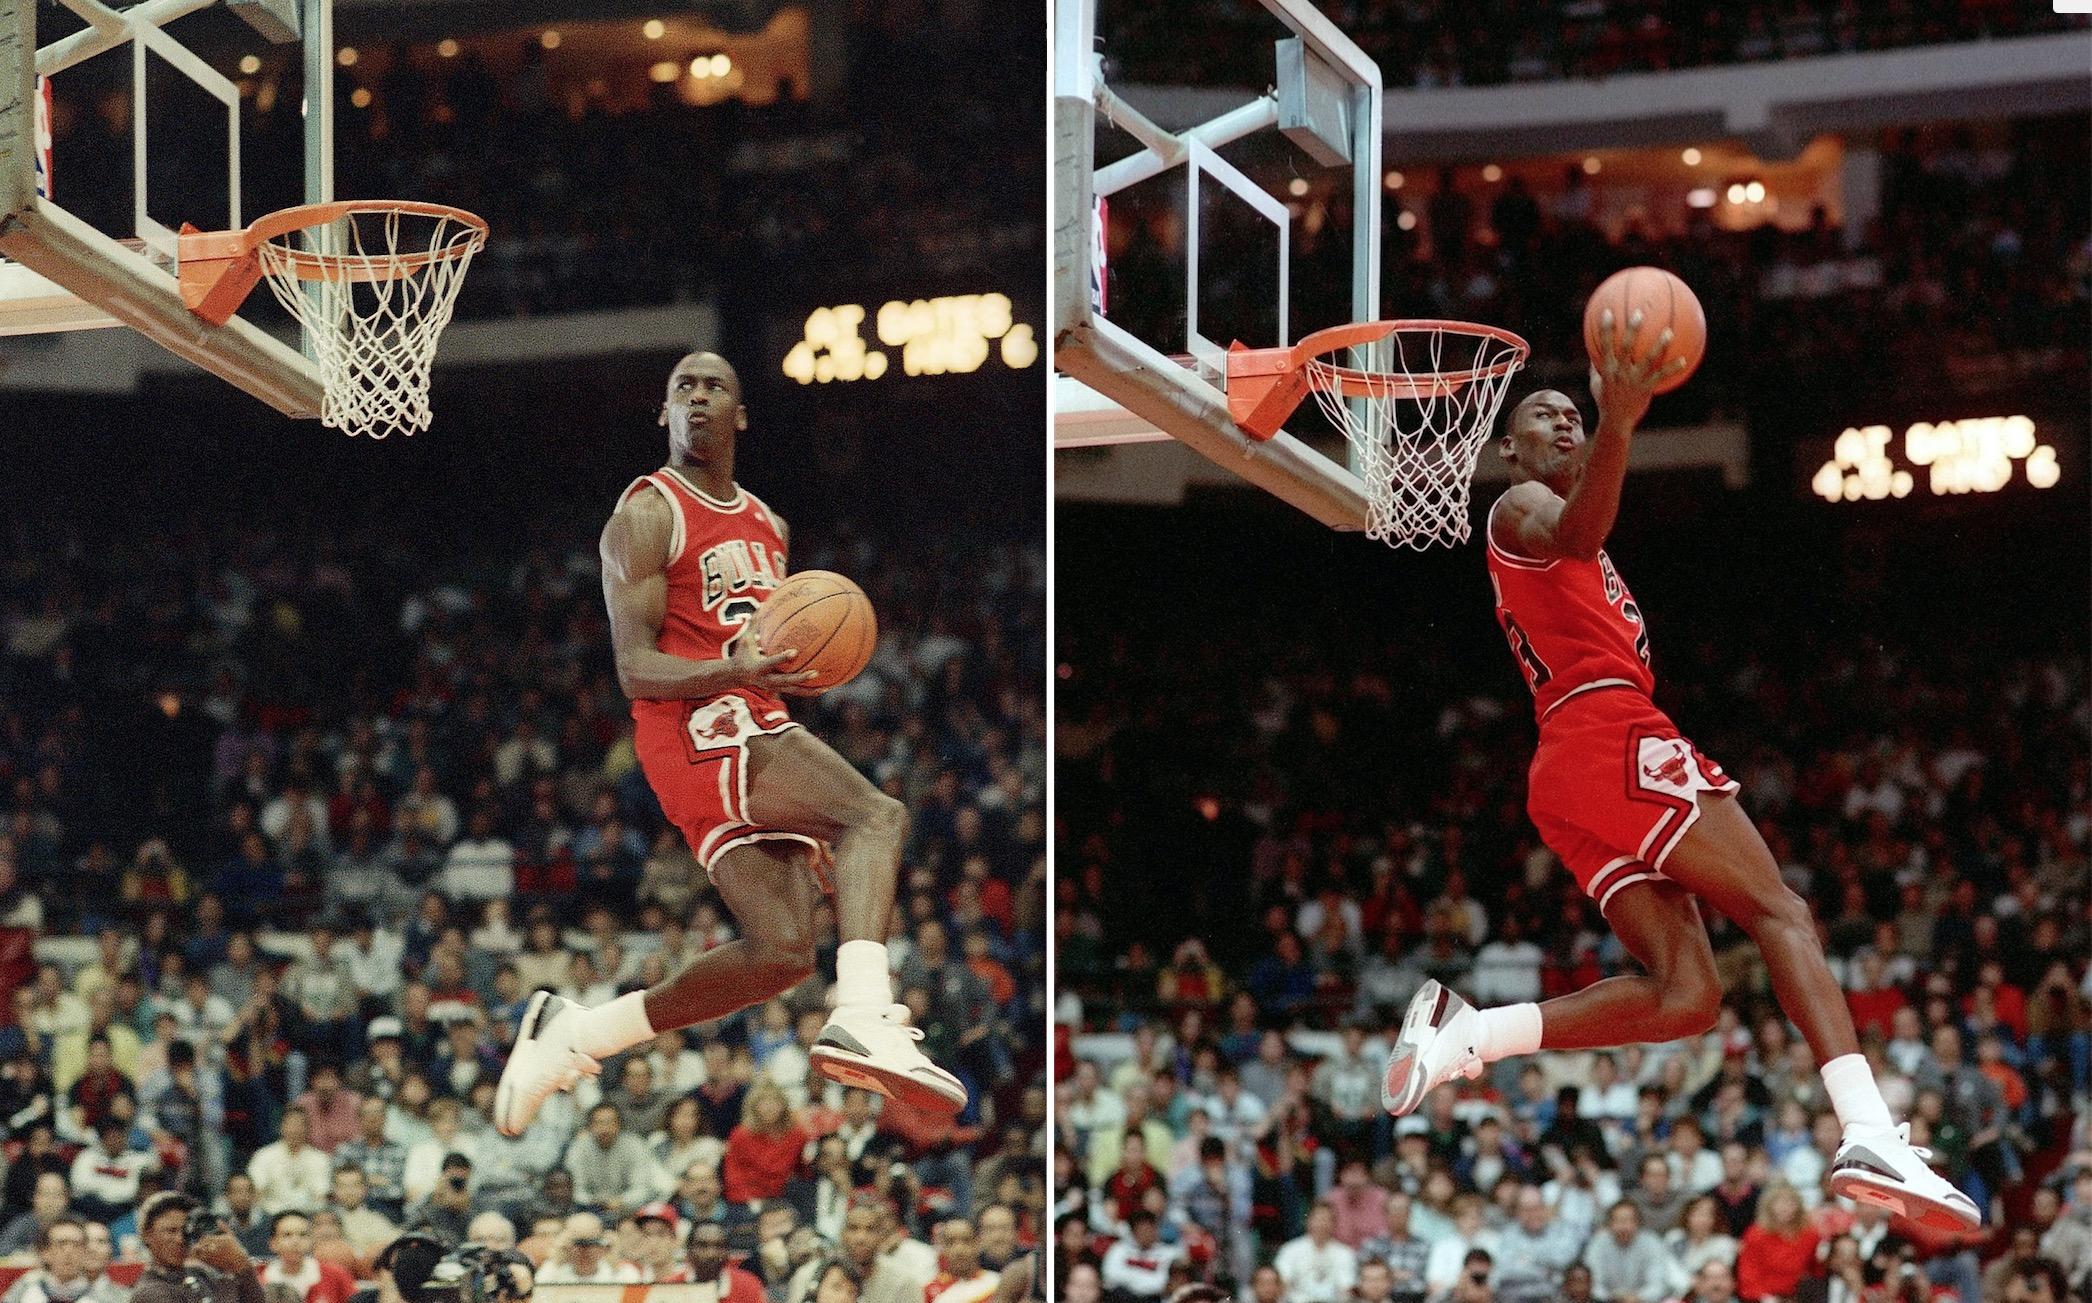 Hd Air Jordan Wallpaper Michael Jordan S Brief But Memorable Slam Dunk Contest